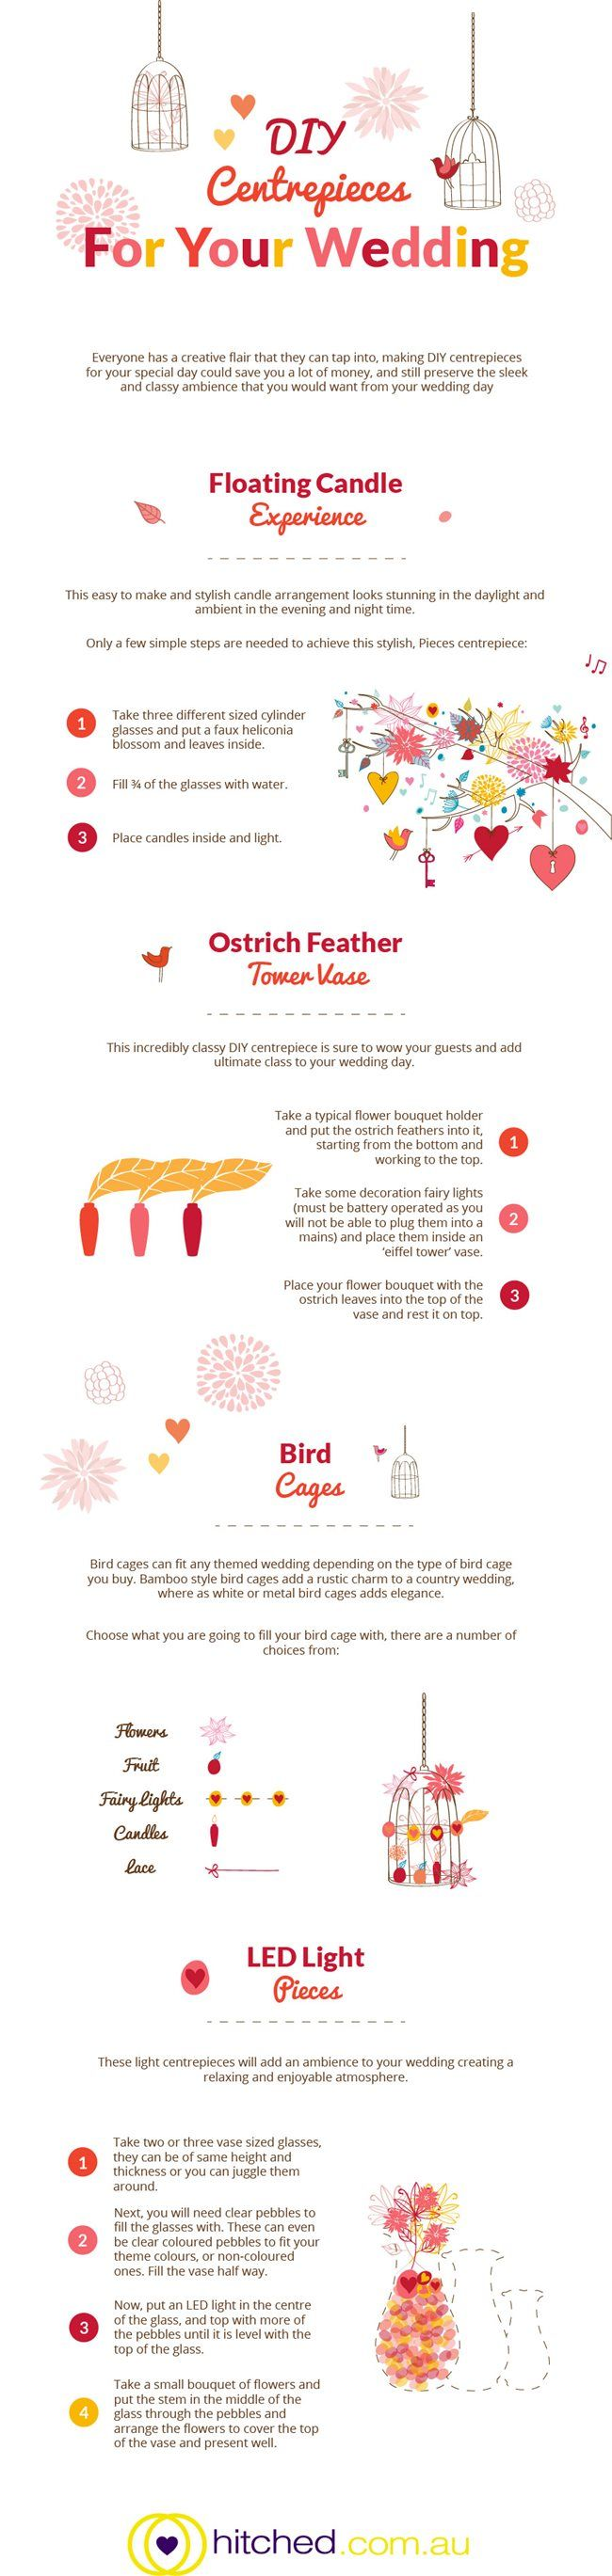 DIY Wedding Centrepiece Ideas infographic #infographic #wedding